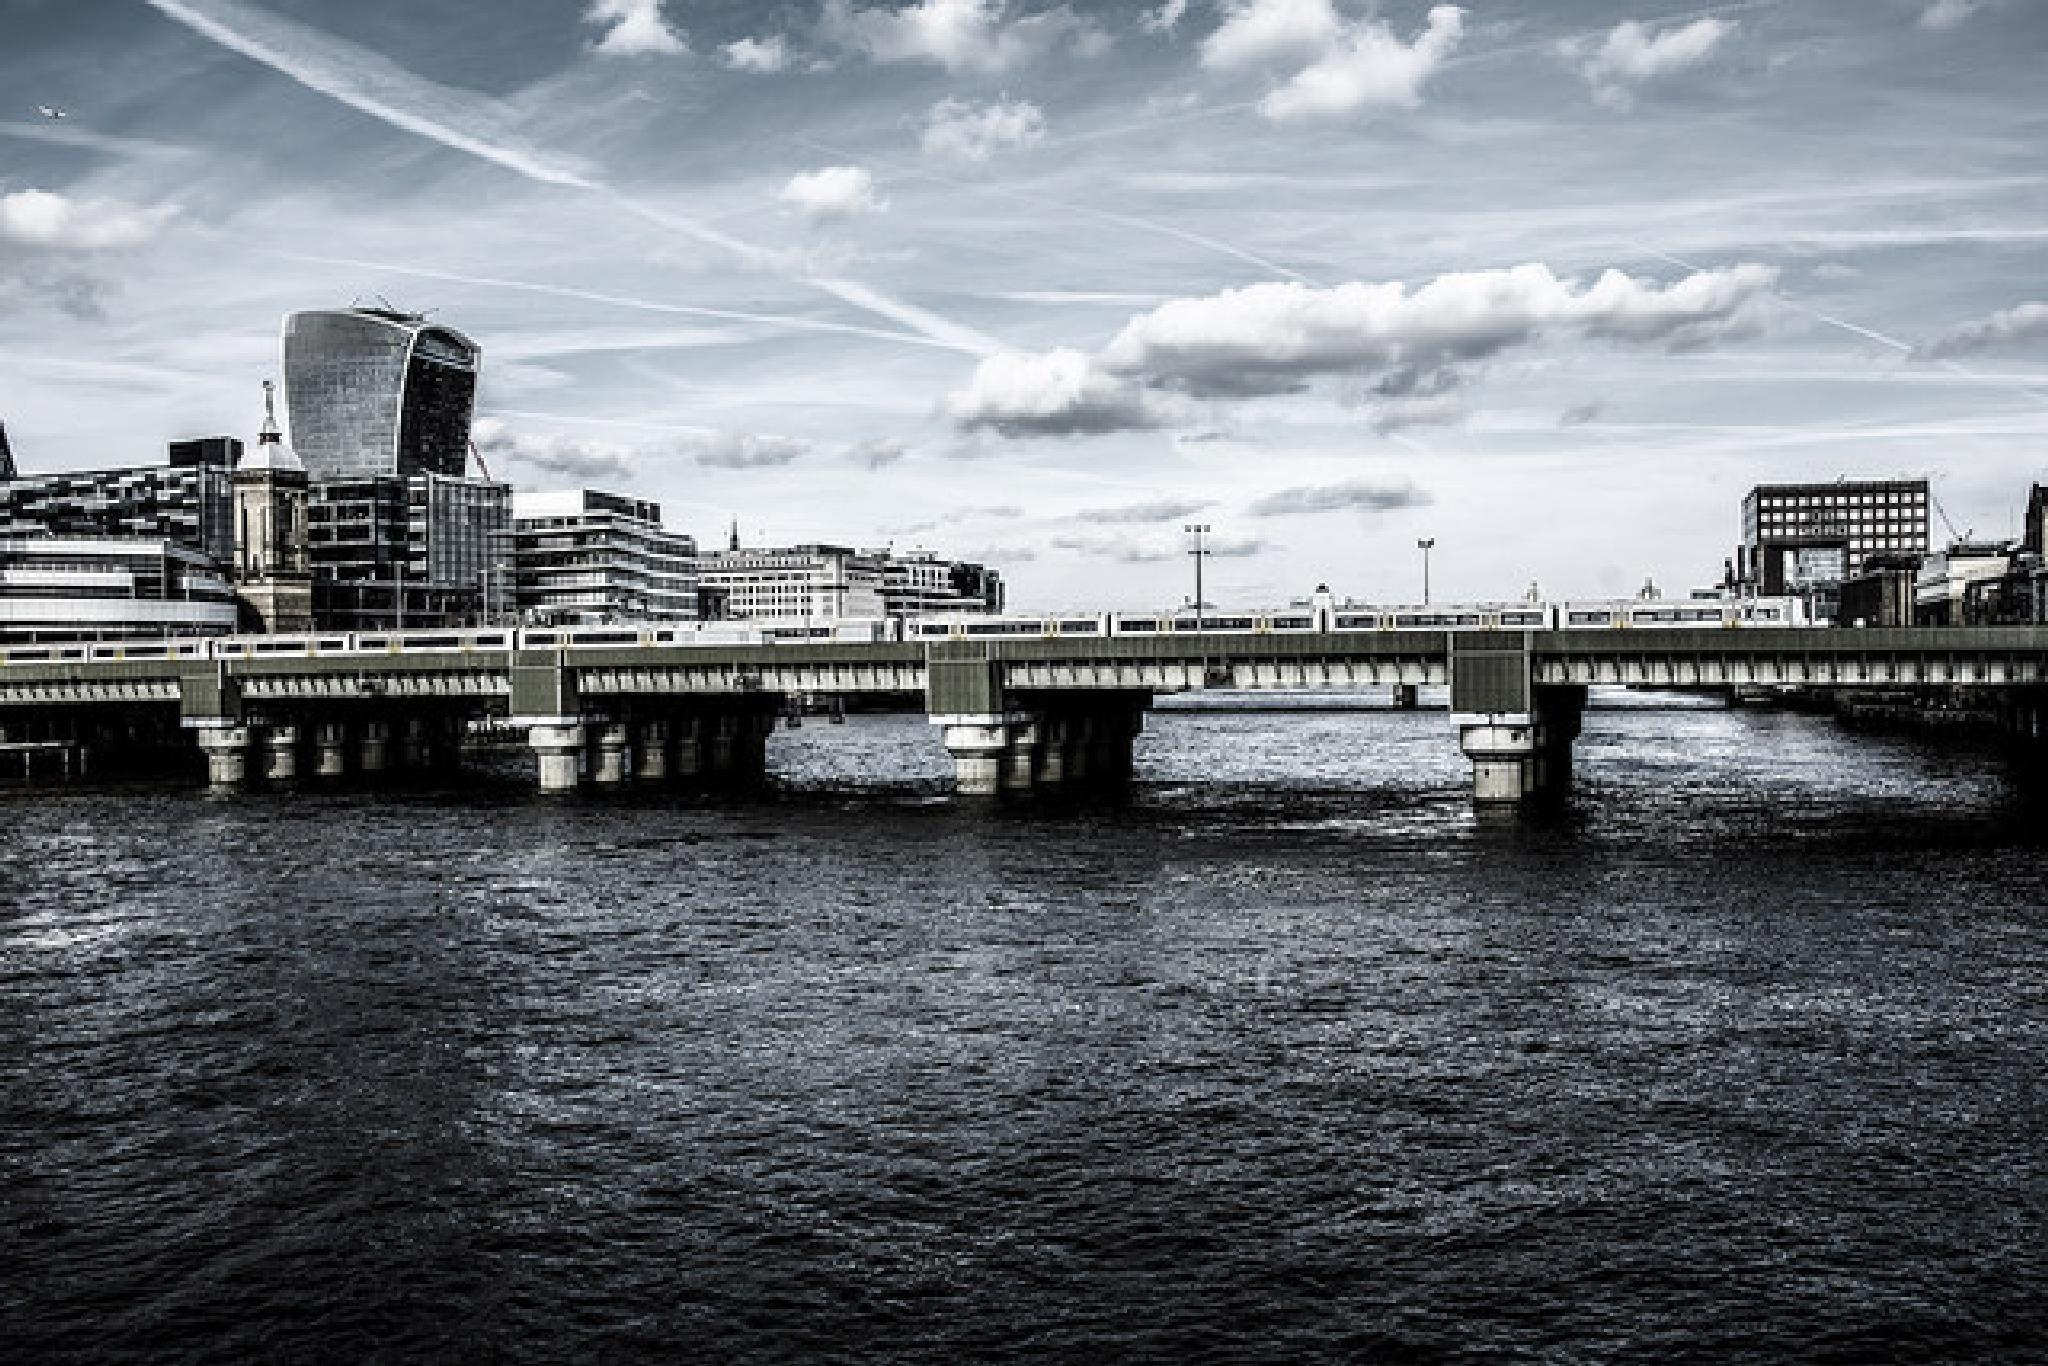 Cityscape London by conceptualurburn